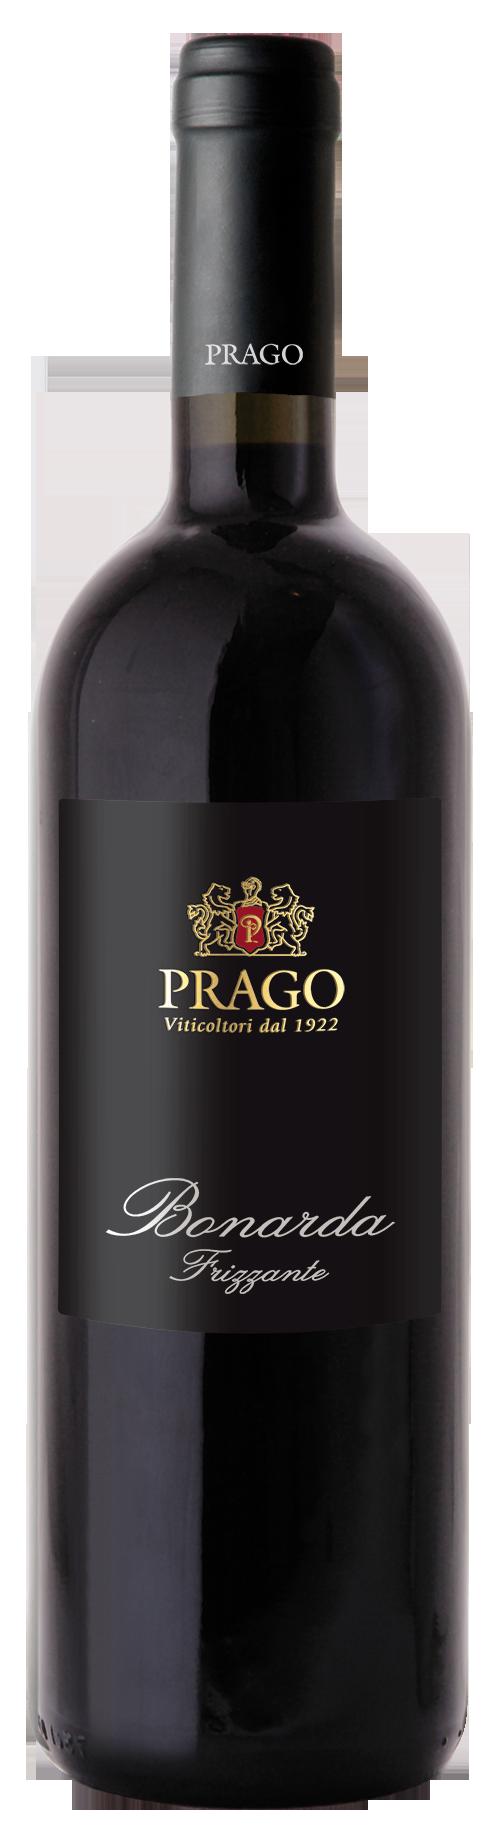 PRAGO Vini e Spumanti Oltrepò Pavese - Vini Vivaci - Bonarda